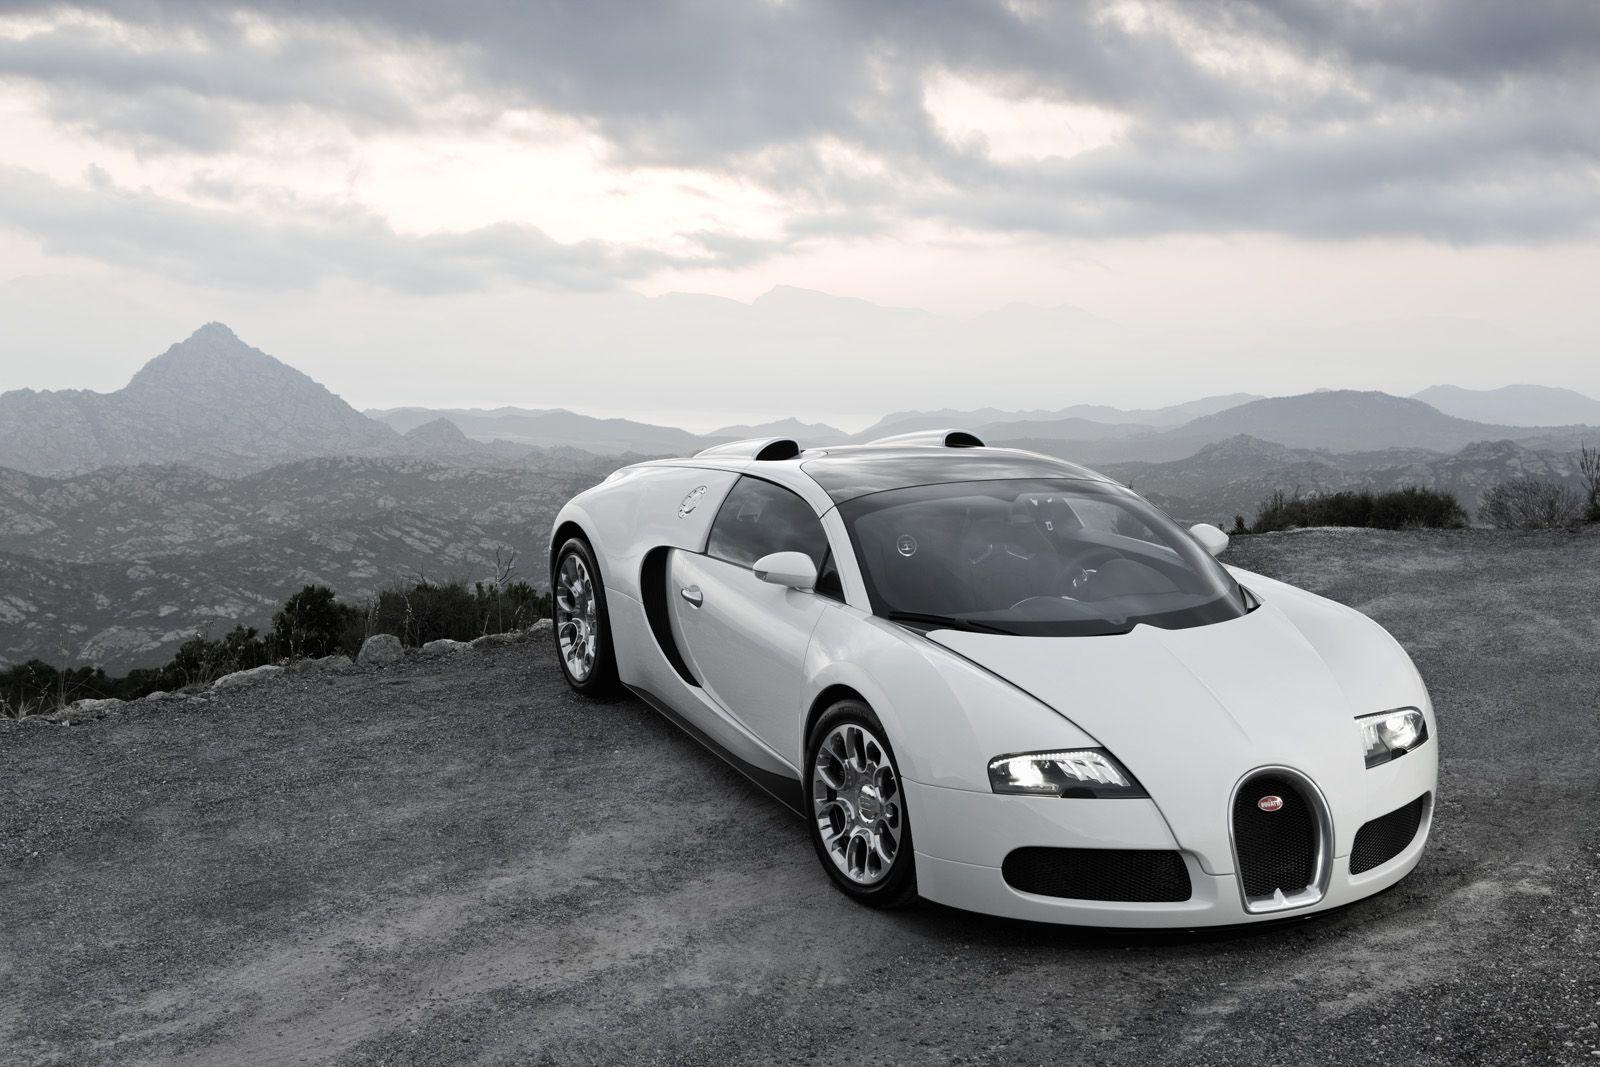 2009 bugatti veyron exotic fast cars pinterest. Black Bedroom Furniture Sets. Home Design Ideas